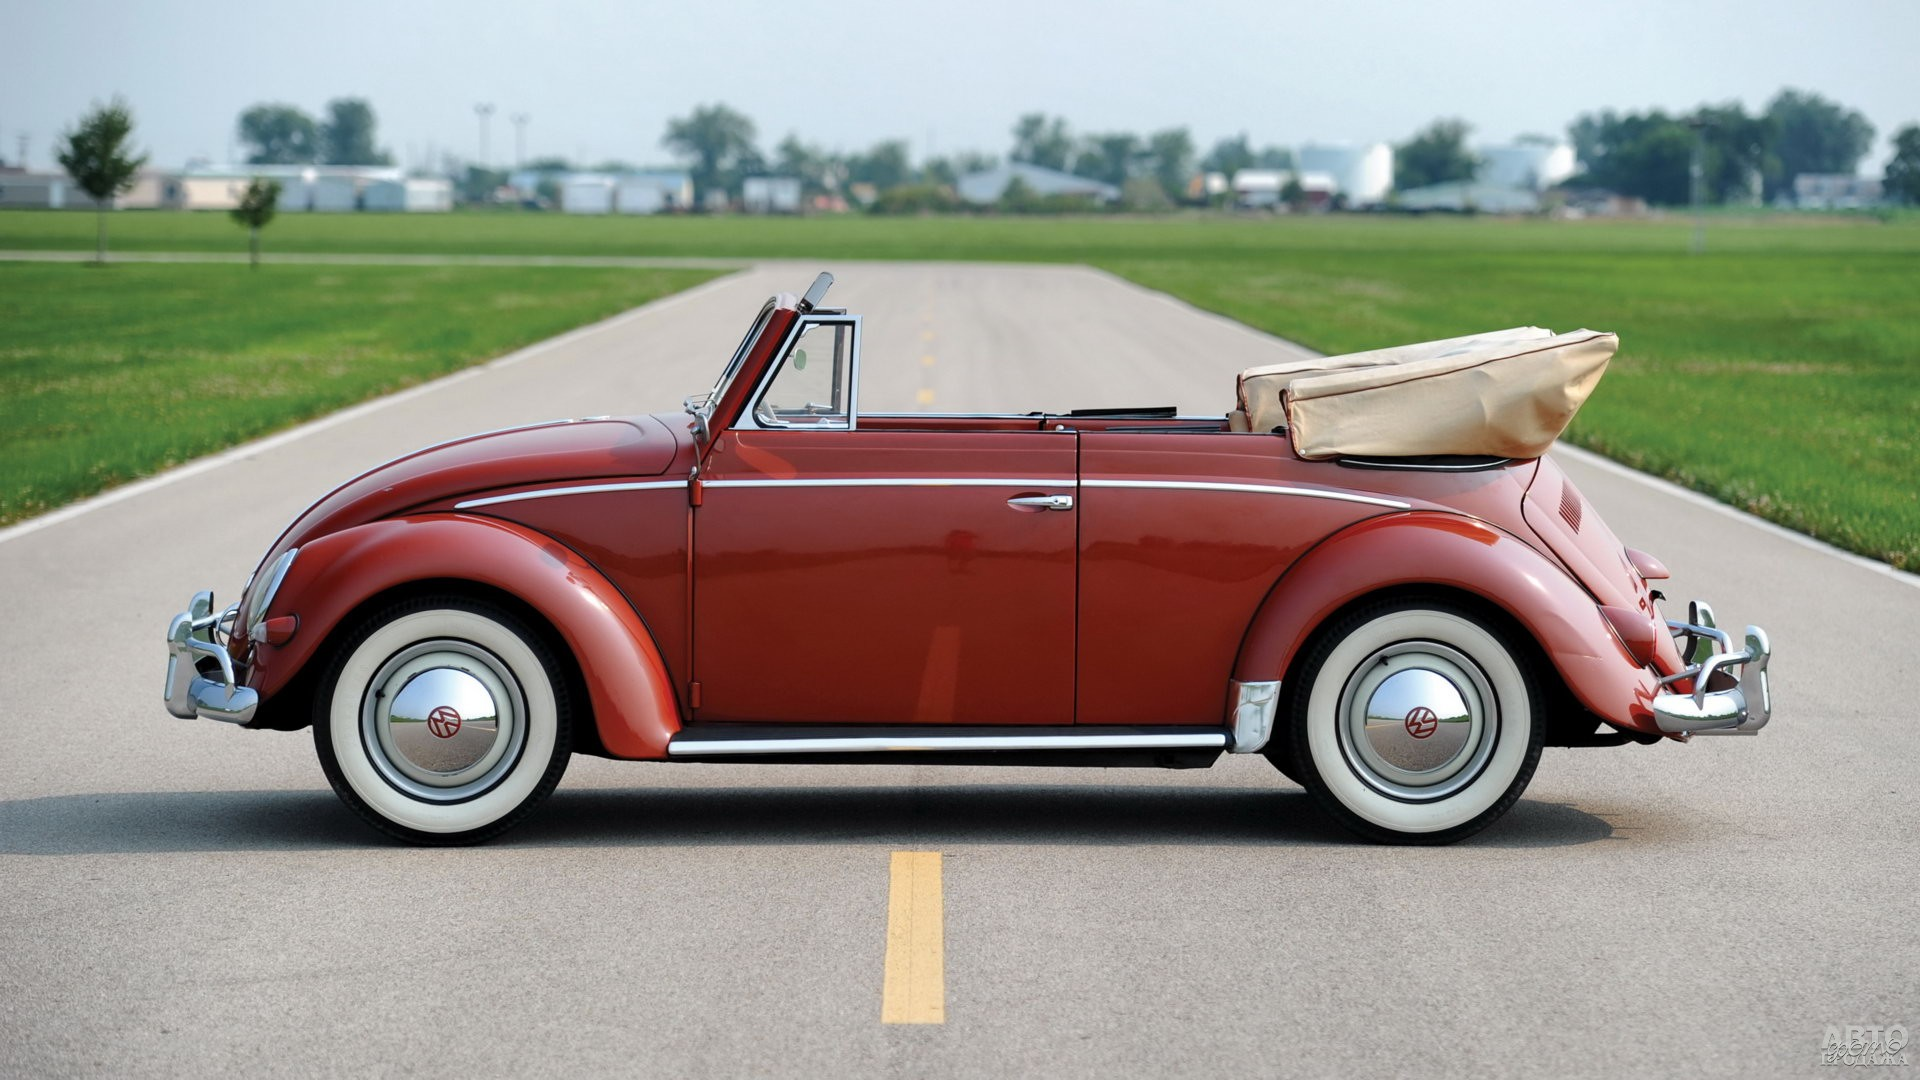 Кабриолет Vоlkswagen Beetle 1957 года